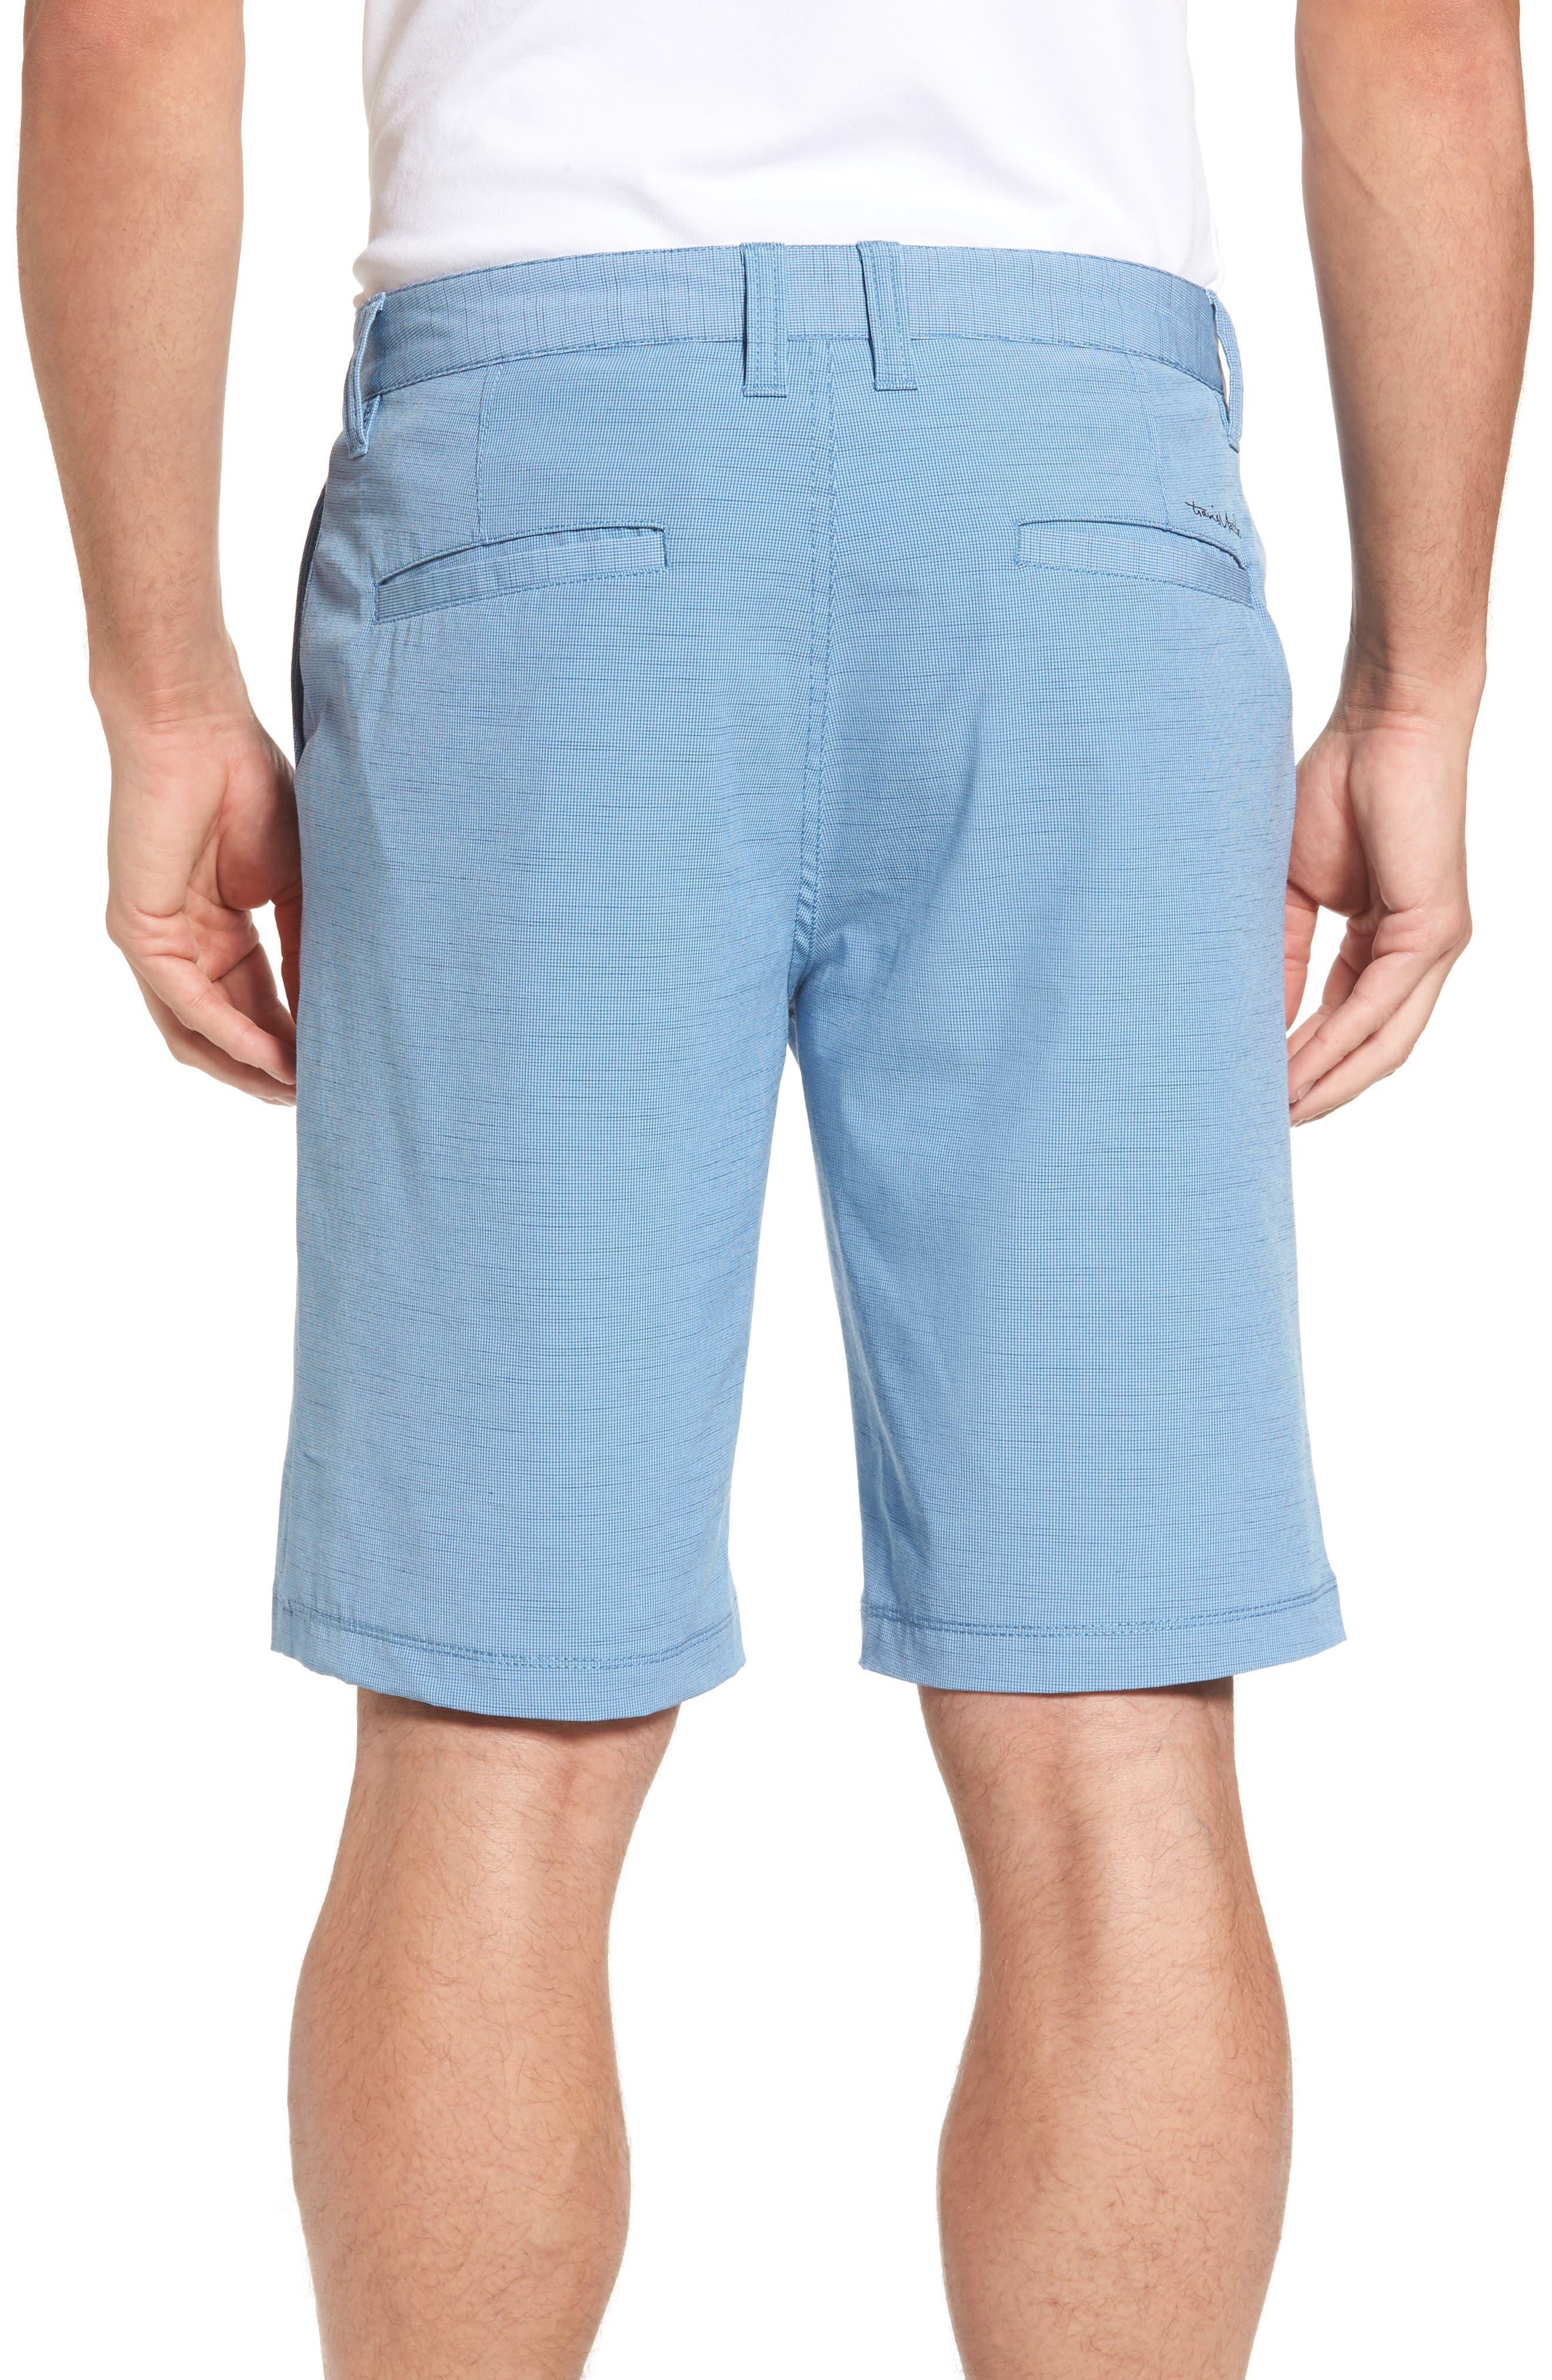 Fisher Shorts,                             Alternate thumbnail 2, color,                             401